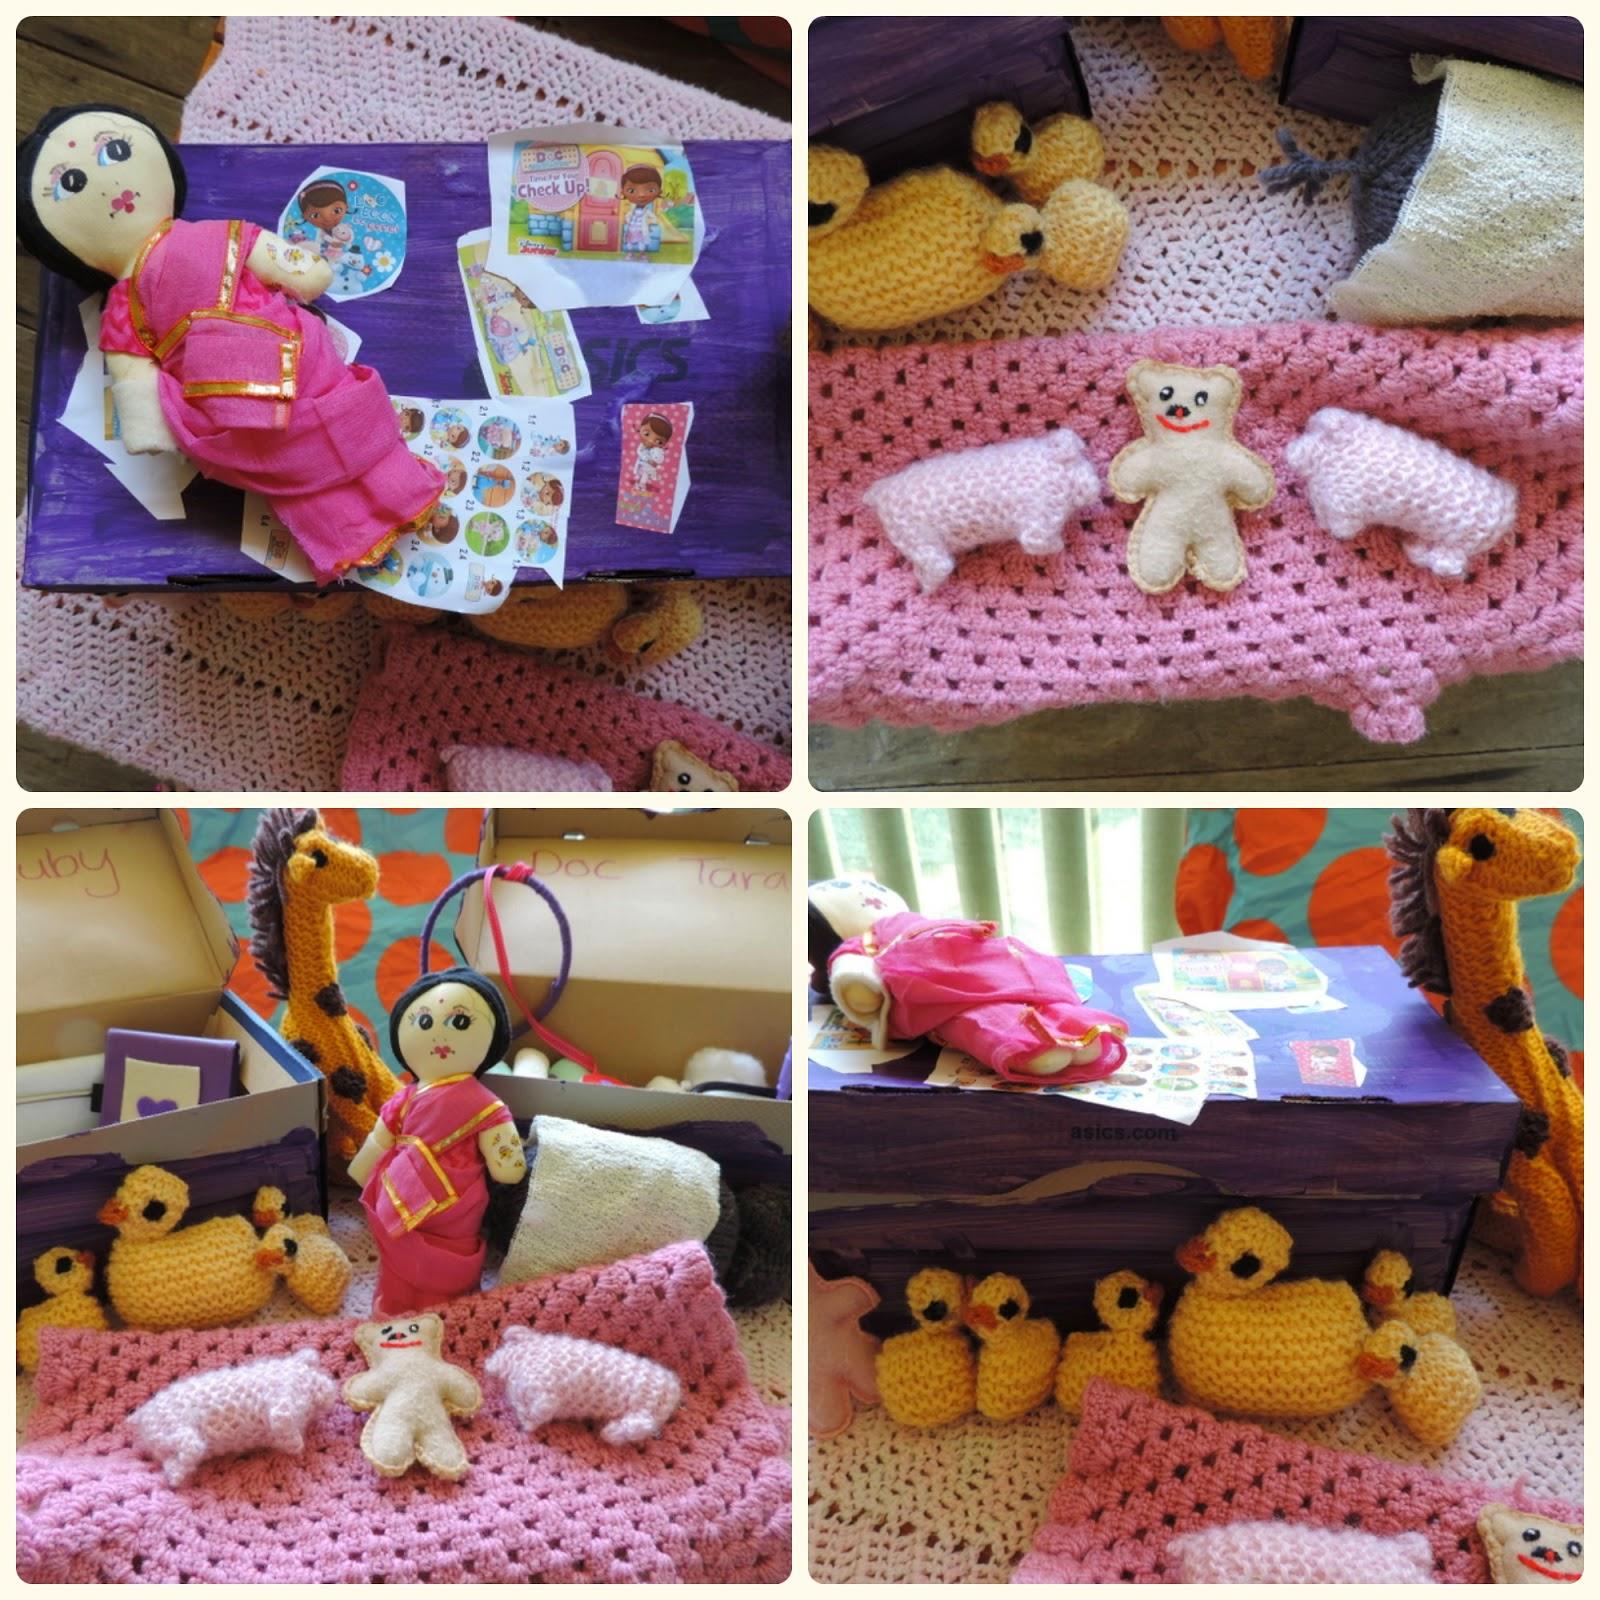 Easy to make, budget friendly Doc's Kit for children - Mummy Musings and Mayhem